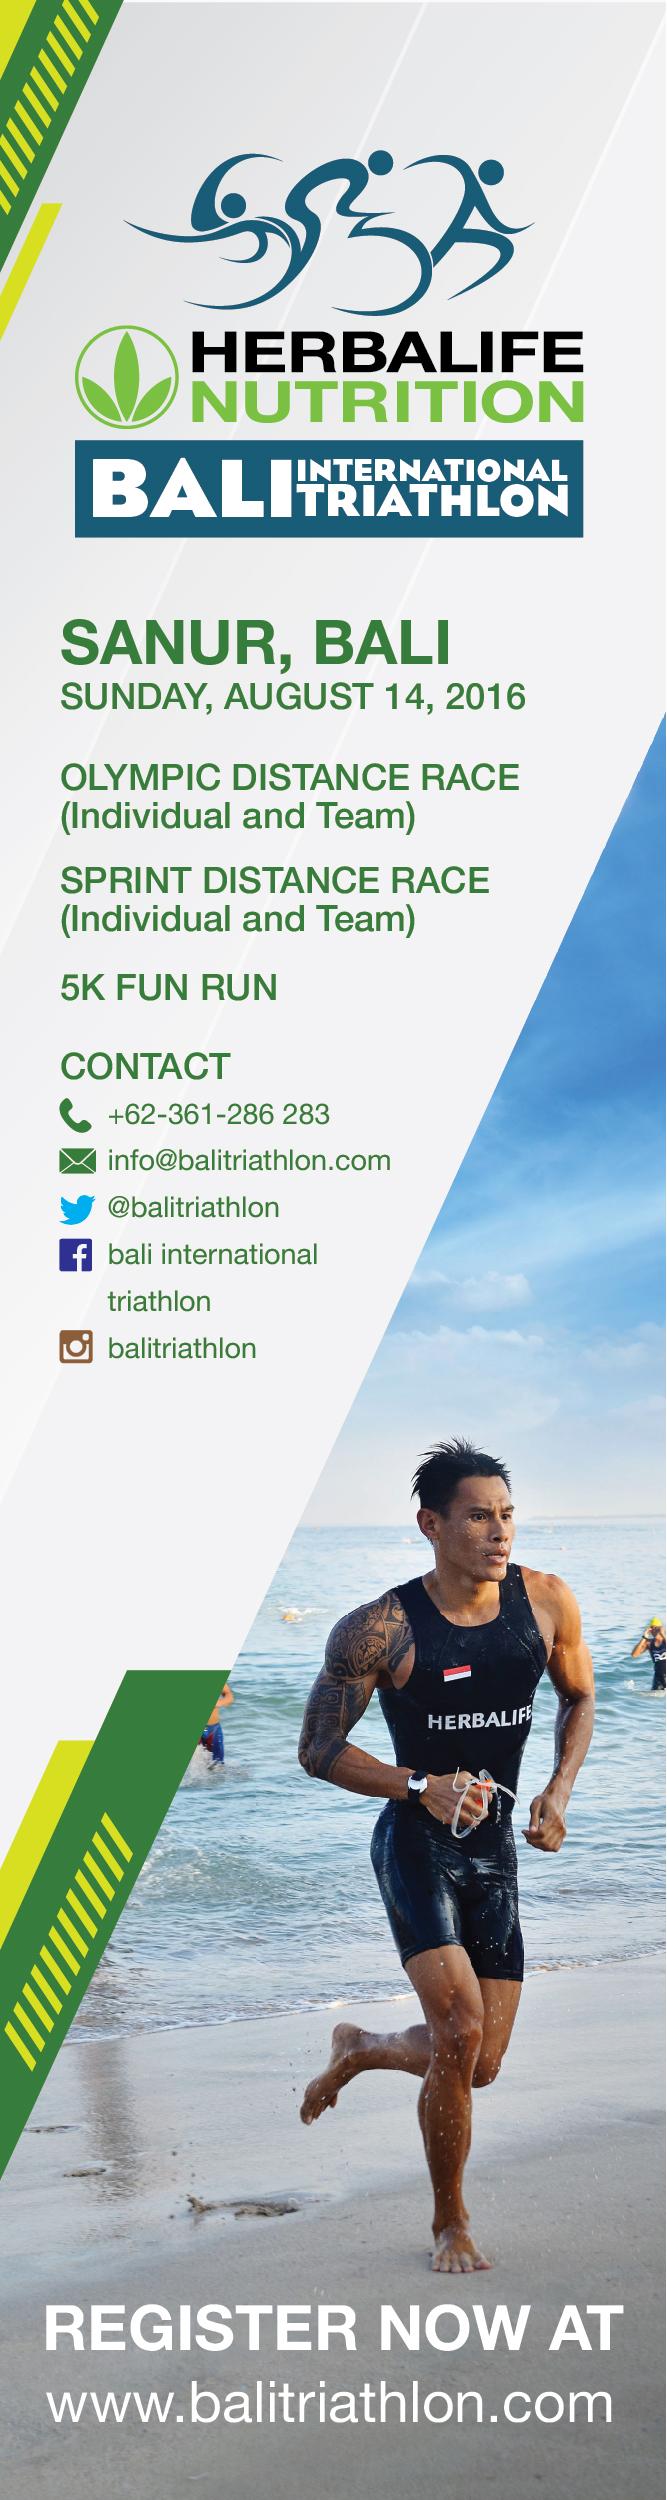 Bali Triathlon